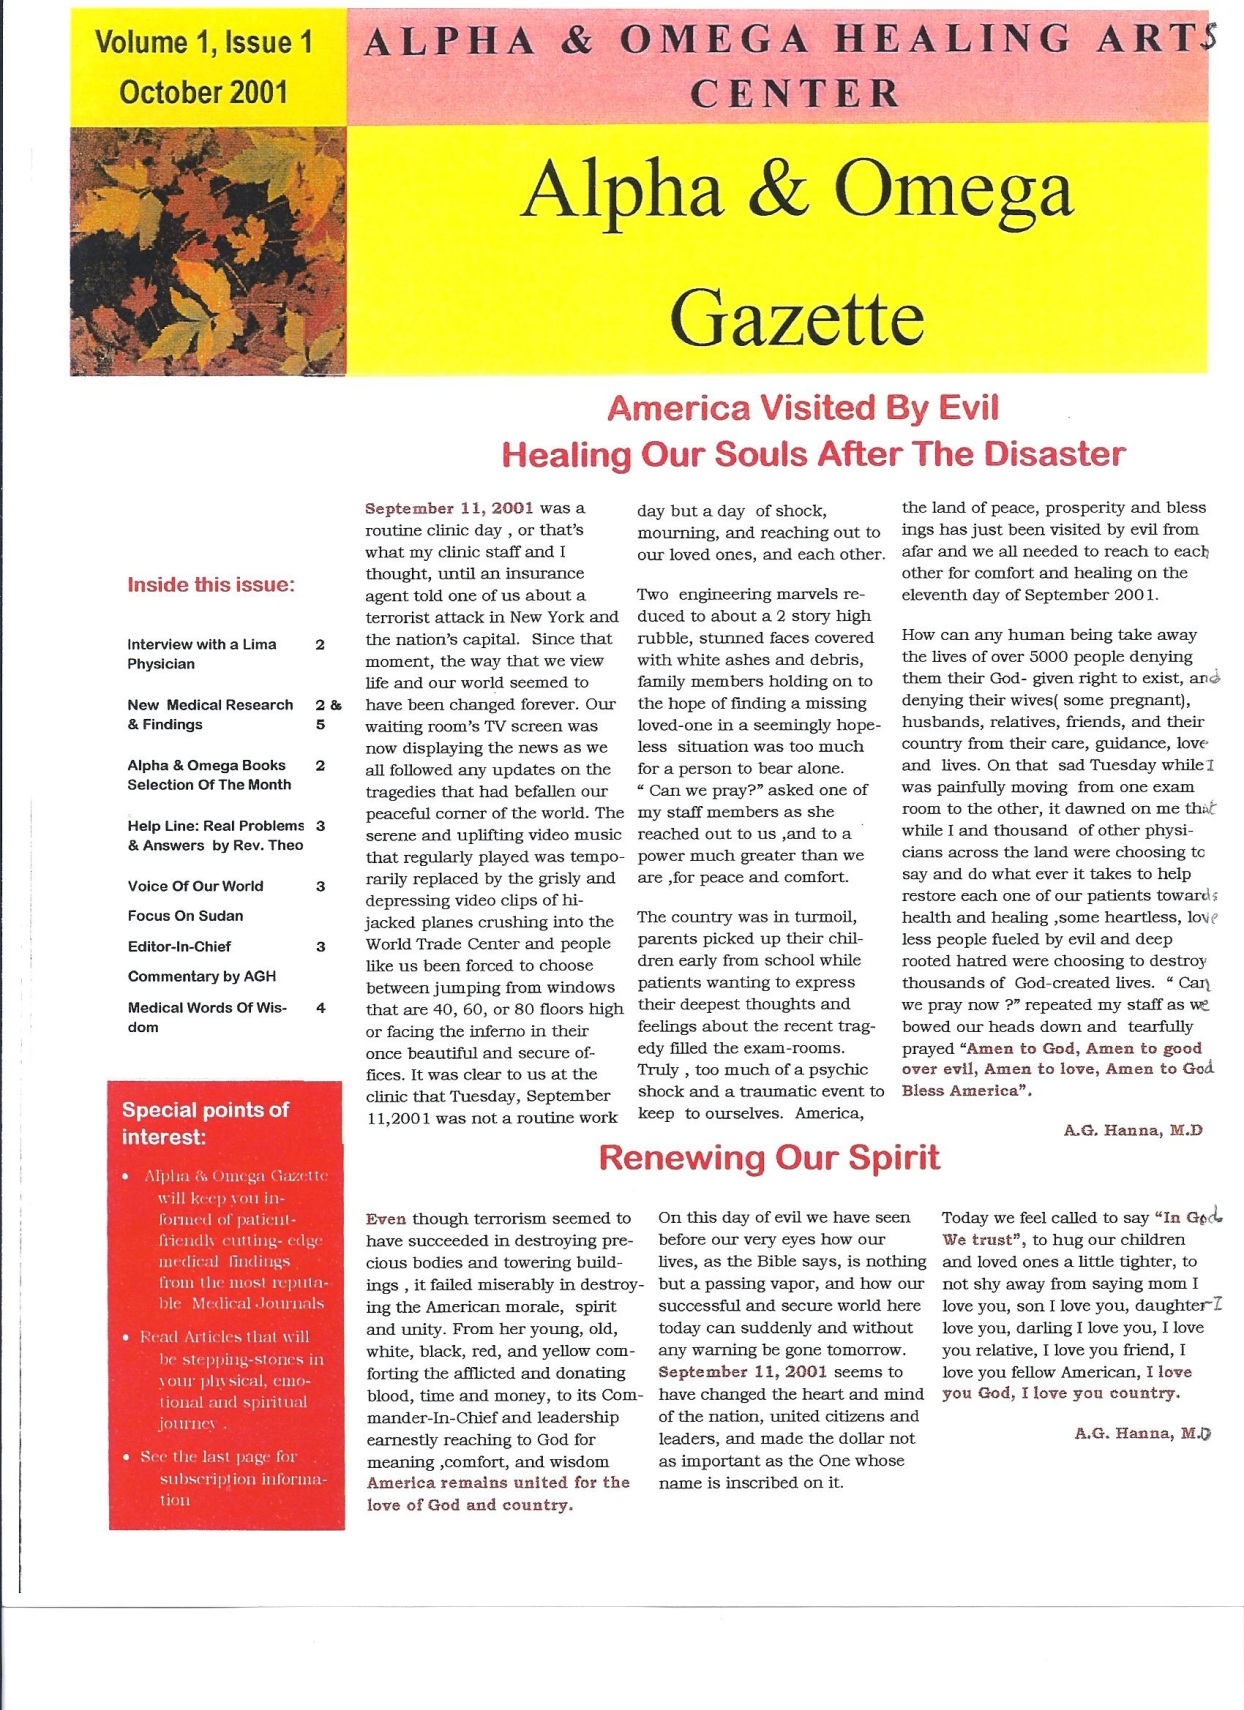 my-article-september-11-2011-artcle-written-in-alpha-omega-gazzette